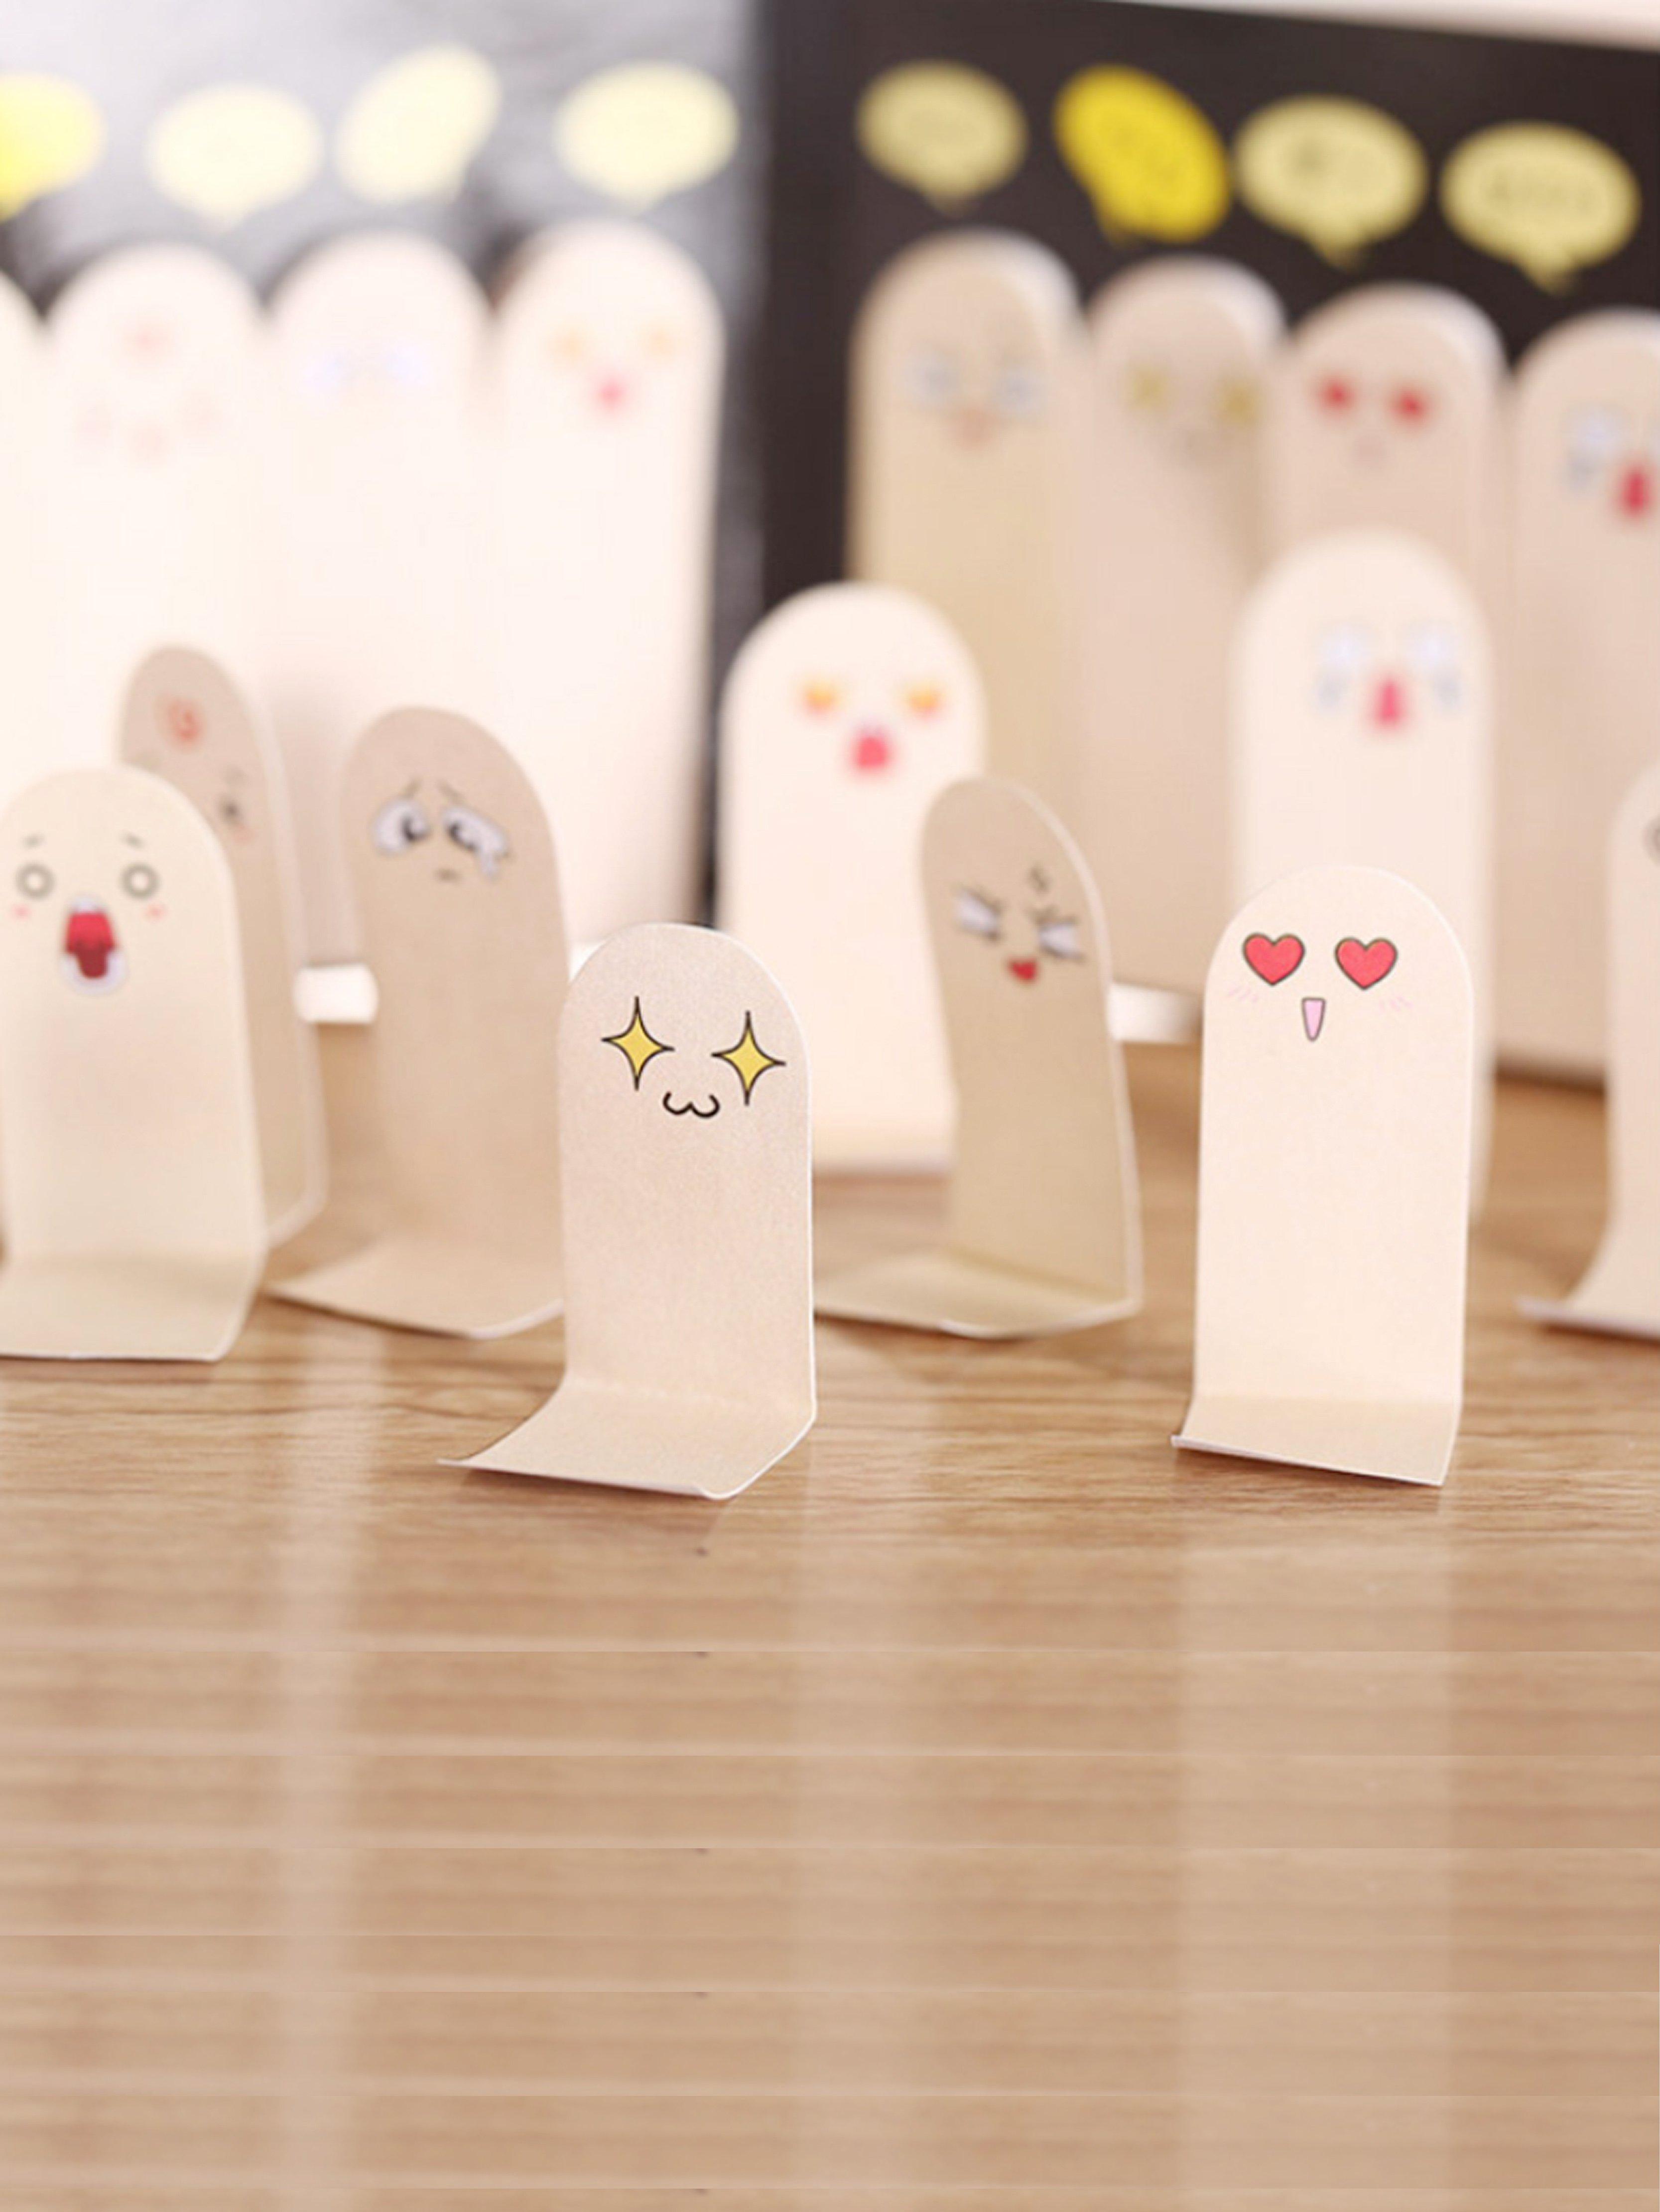 Cartoon Emoji Sticky Memo Pads 200sheets 1pc lot cute rabbit design memo pad office accessories memos sticky notes school stationery post it supplies tt 2766